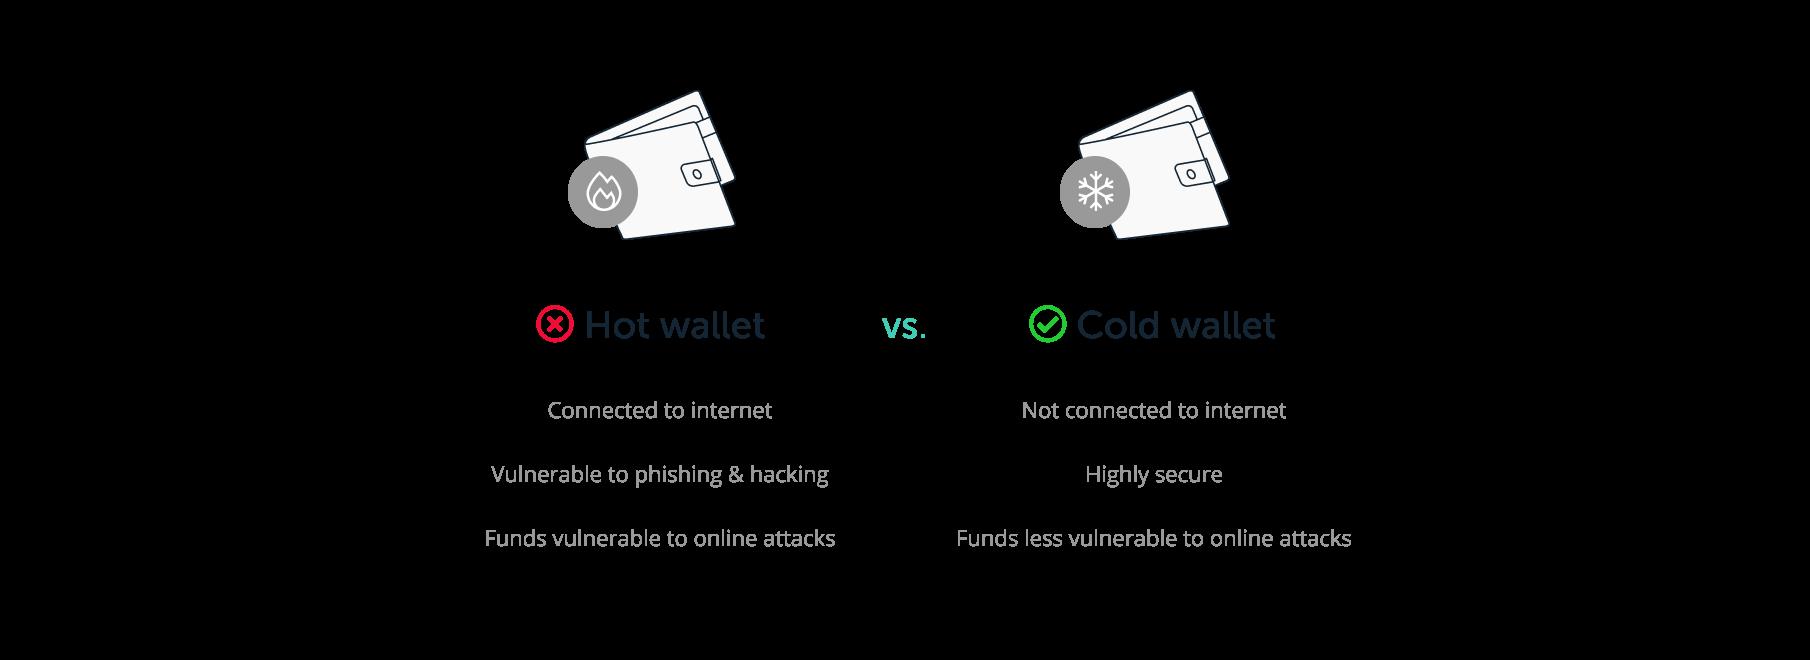 Hot wallet vs. Cold wallet